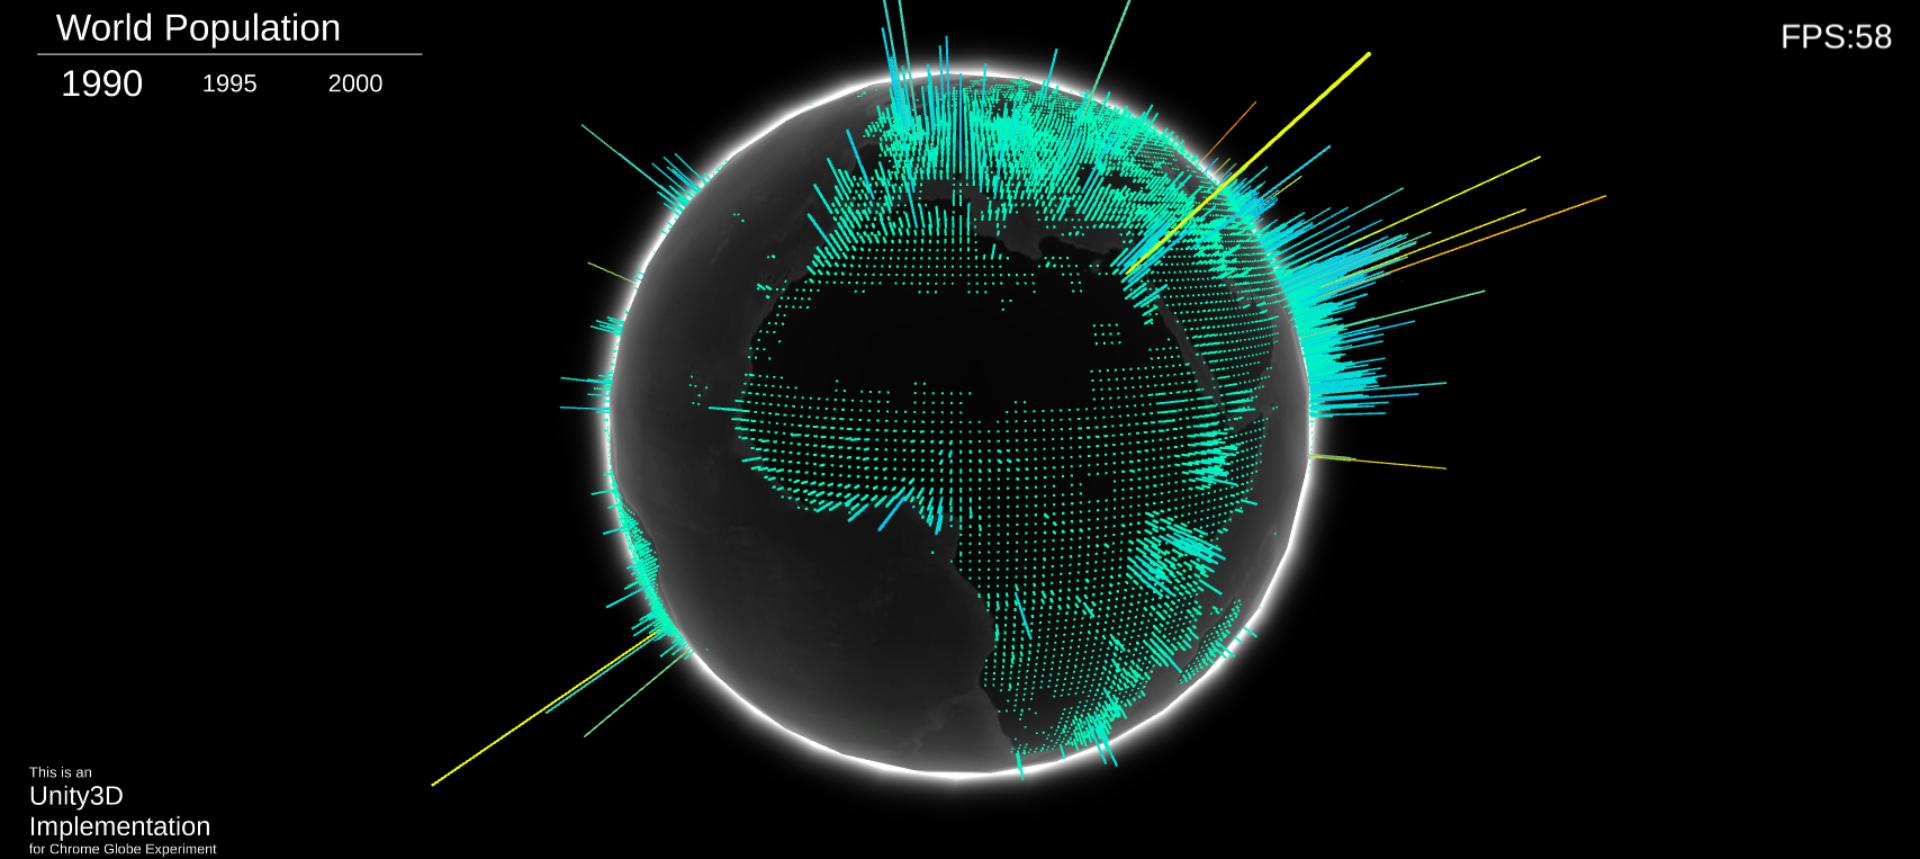 Unity3D-Globe